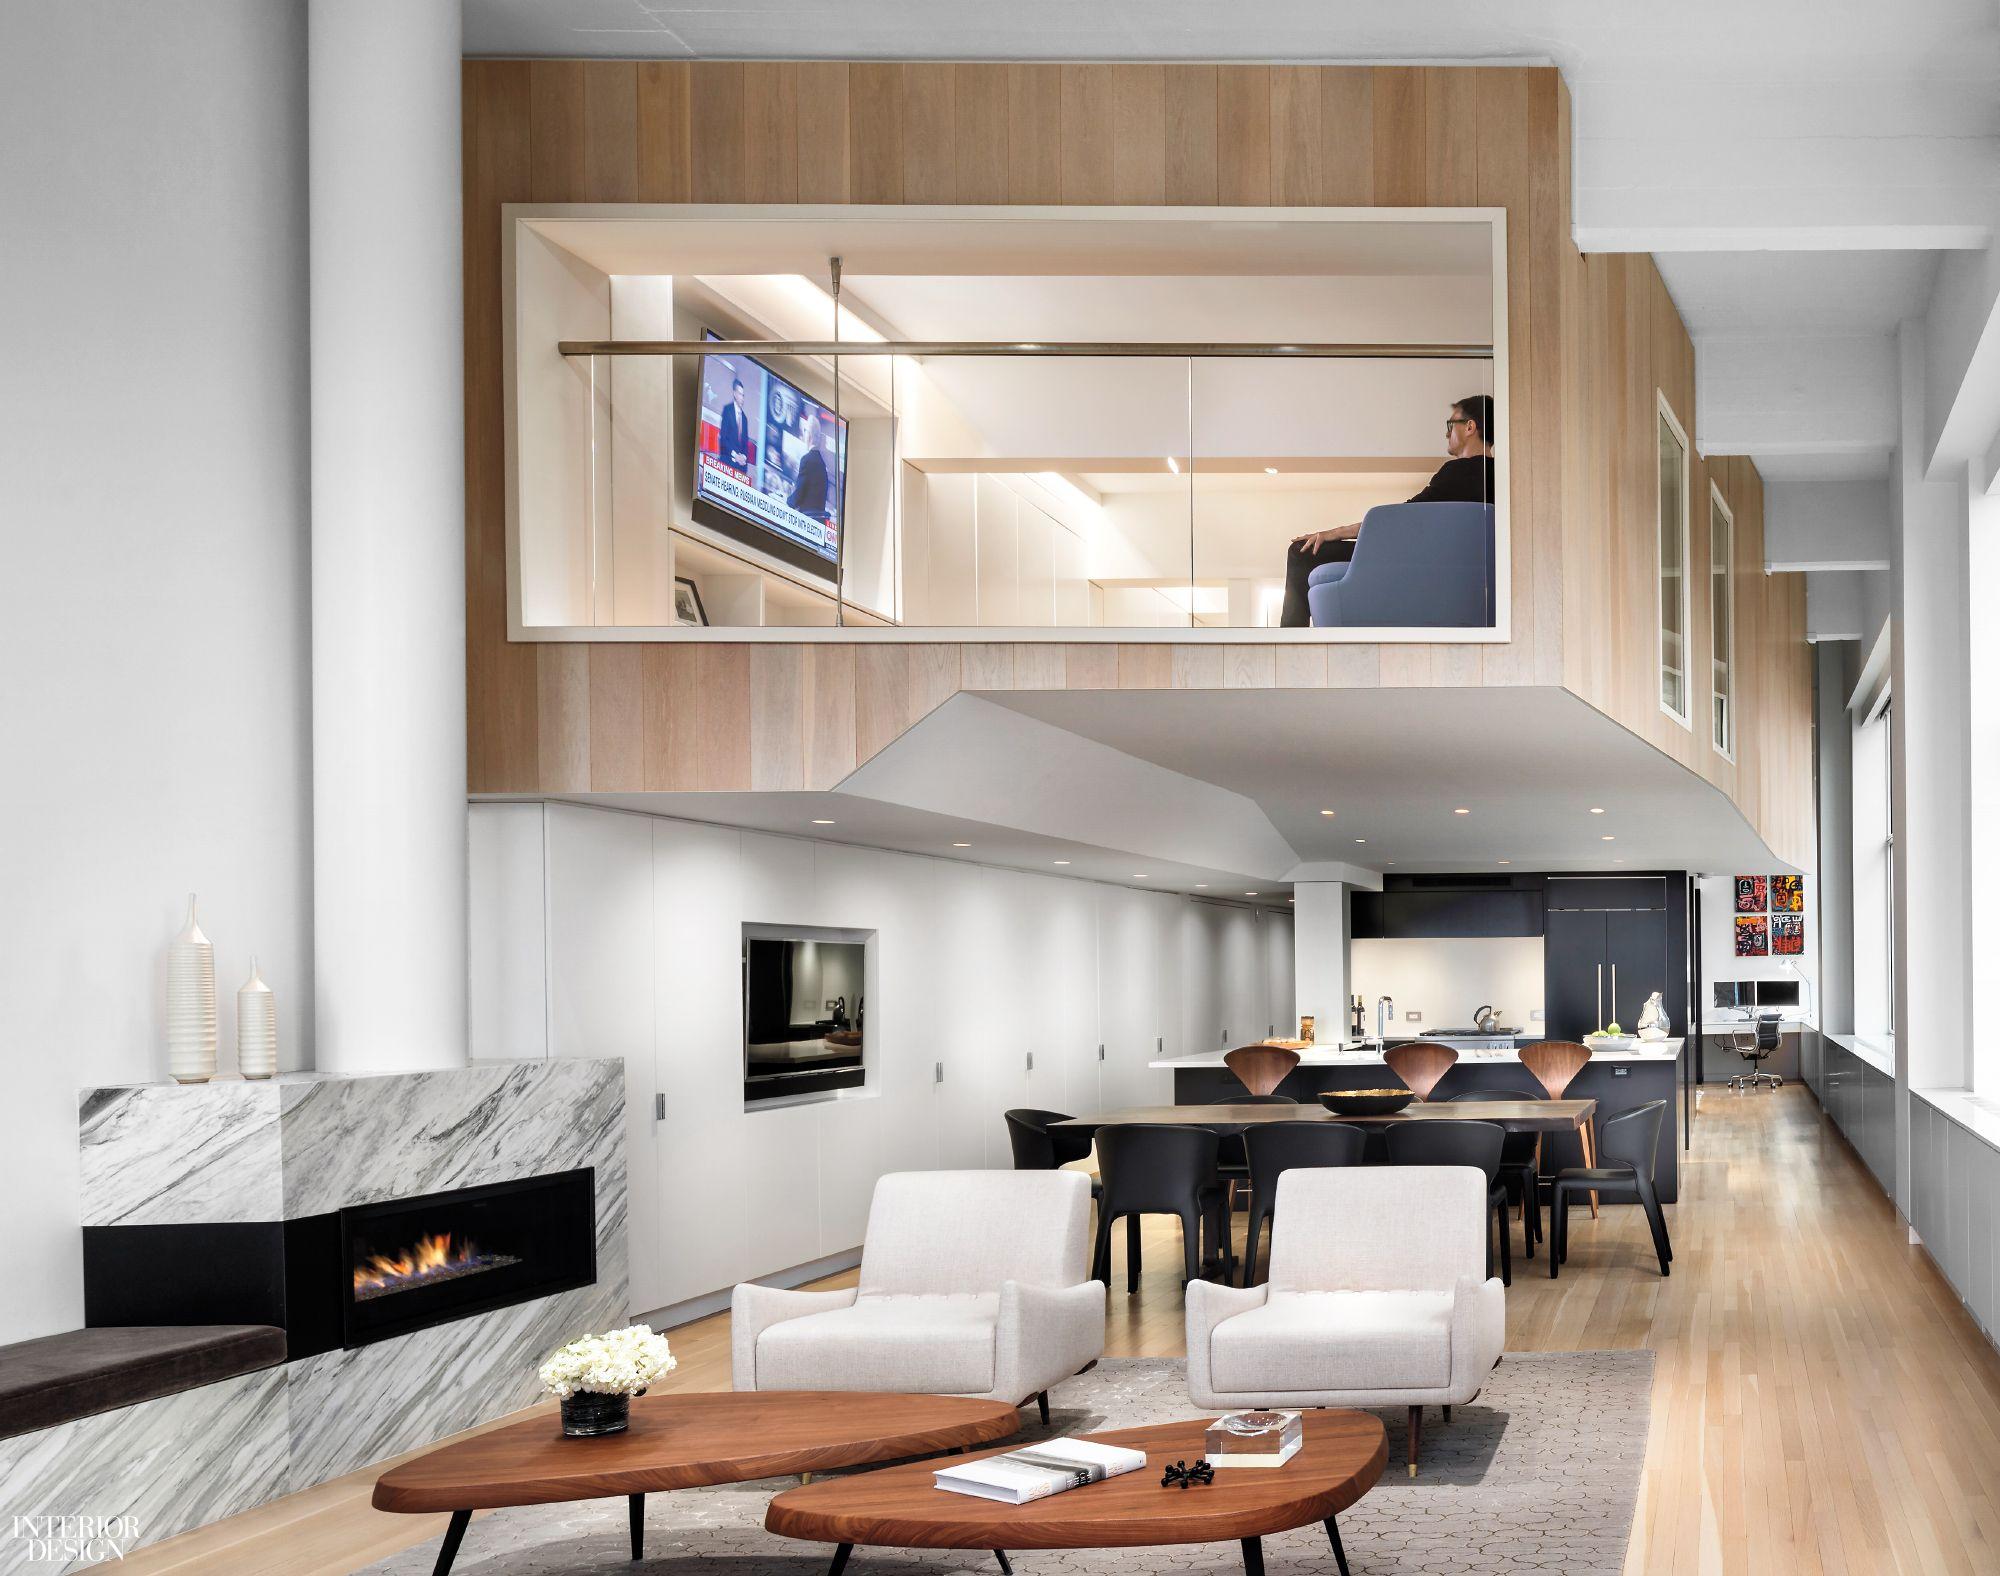 Duplex Loft By Joel Sanders Architect 2017 Best Of Year Winner For Small Apartment